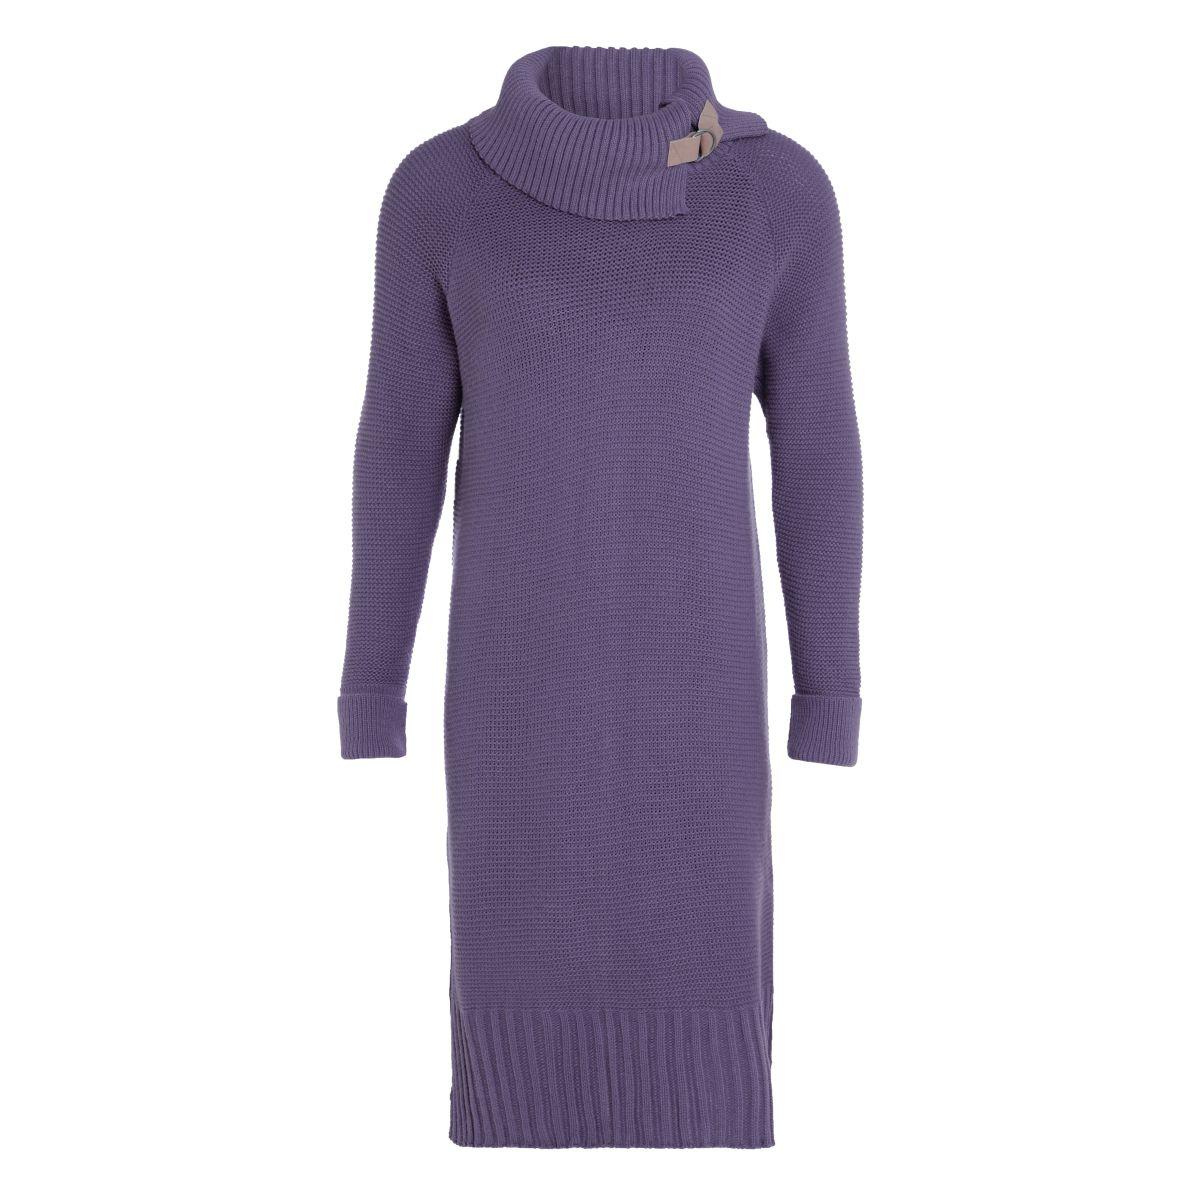 jamie knitted dress violet 3638